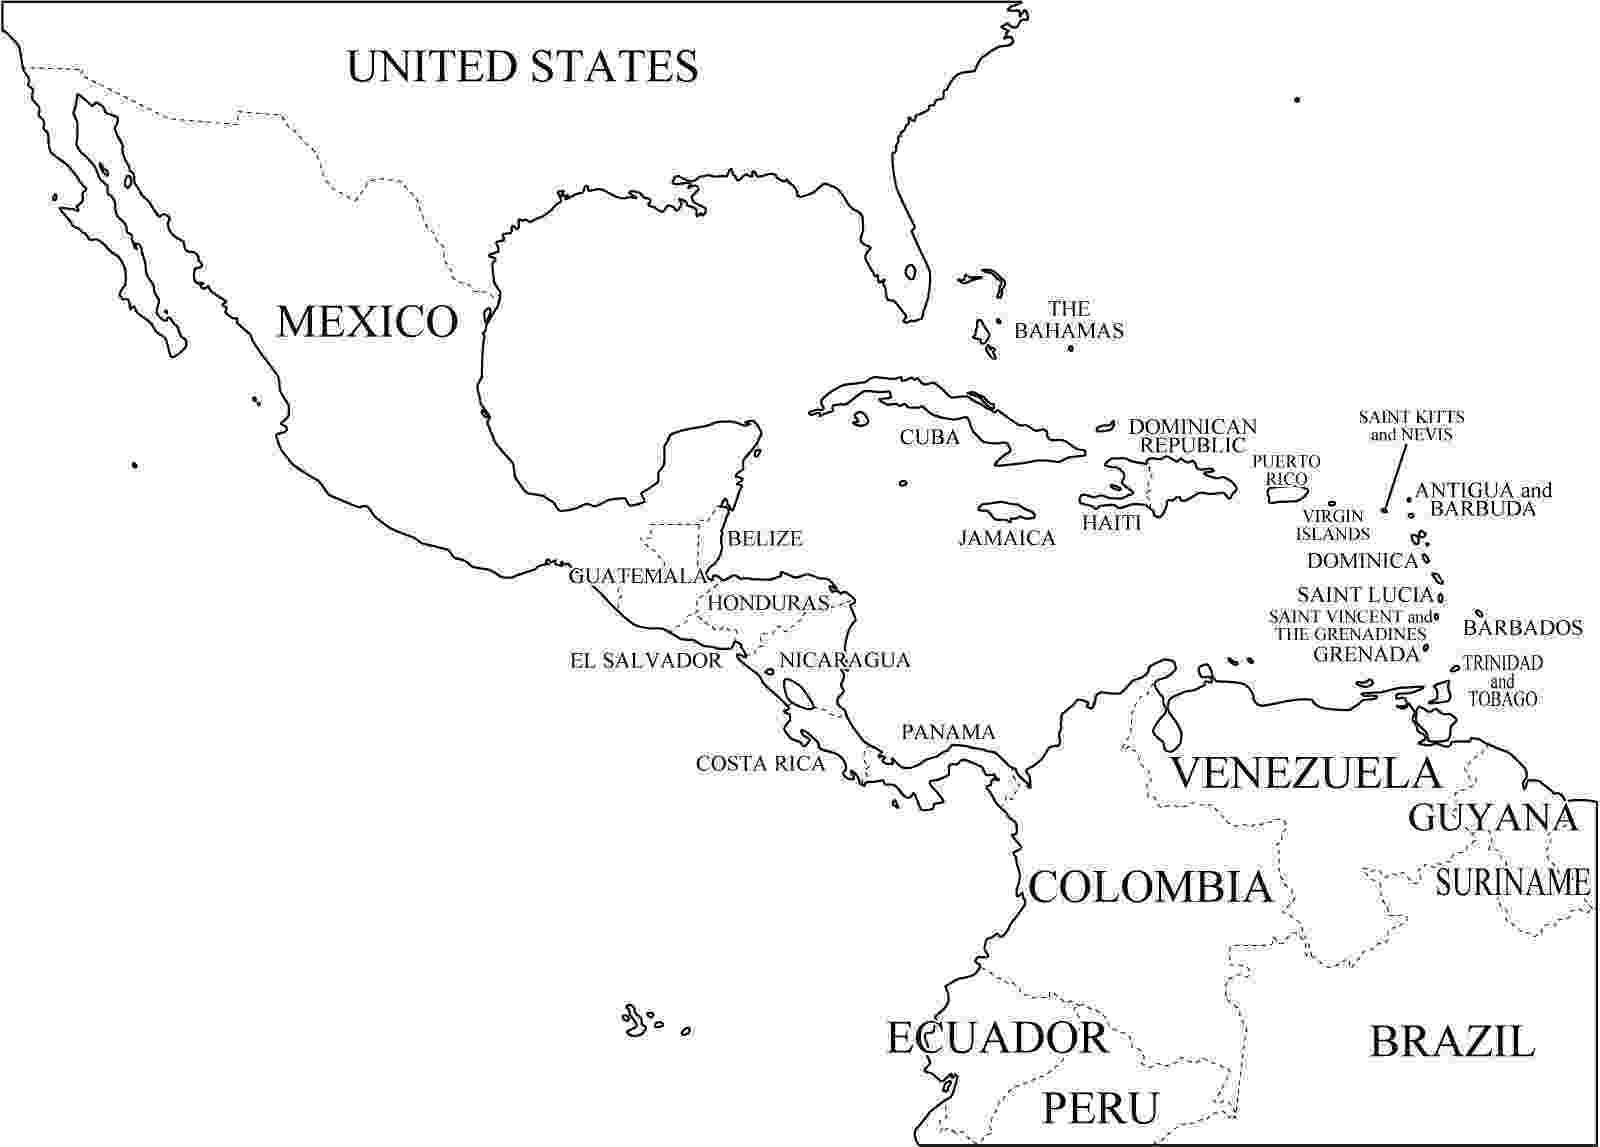 mapa de centroamerica mapa de costa rica para colorear mapa de centroamerica